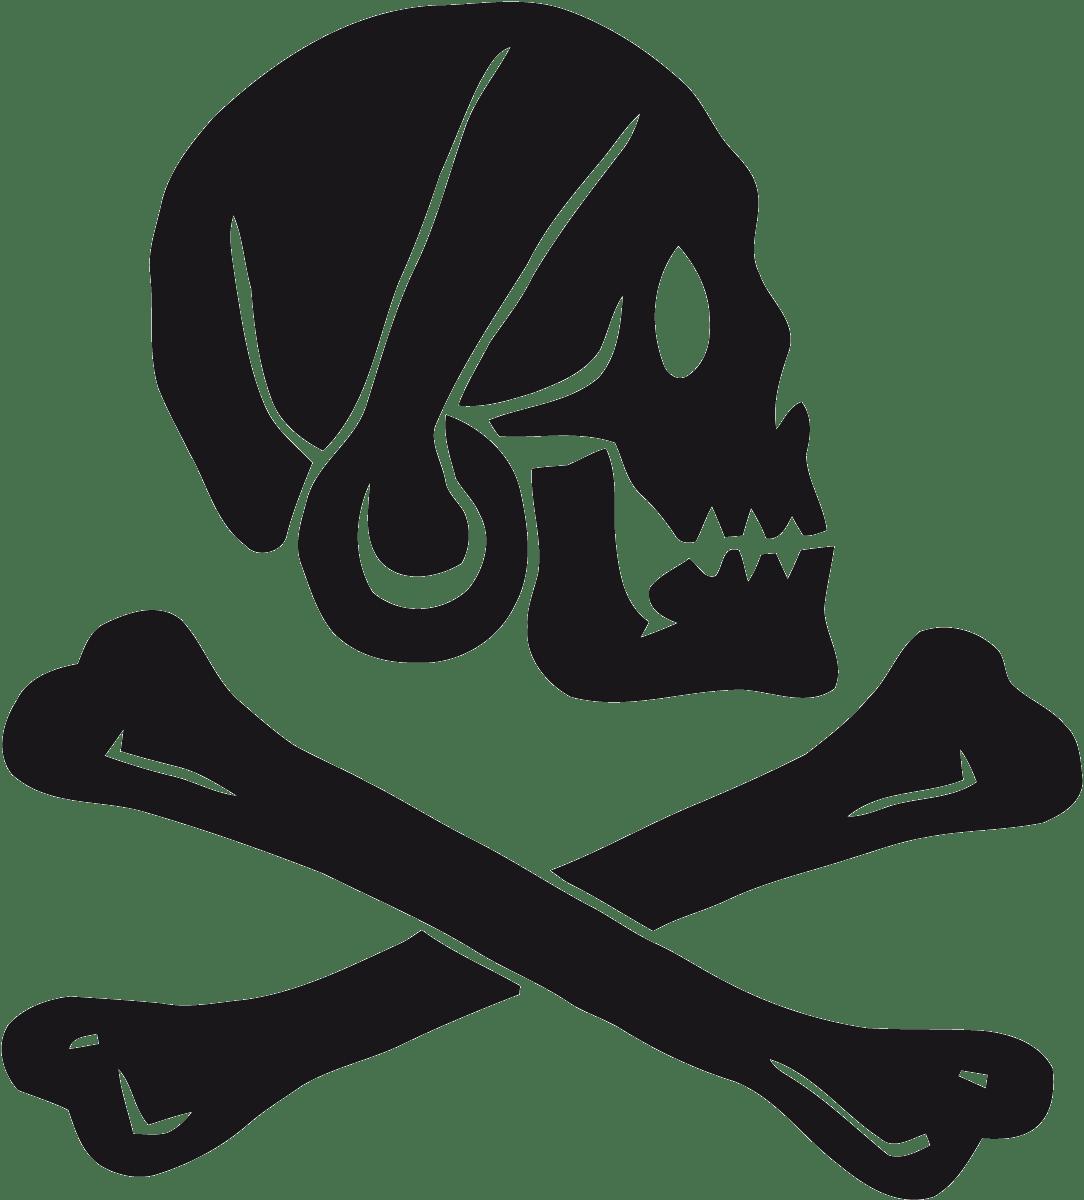 Aufkleber: Pirate Henry Every